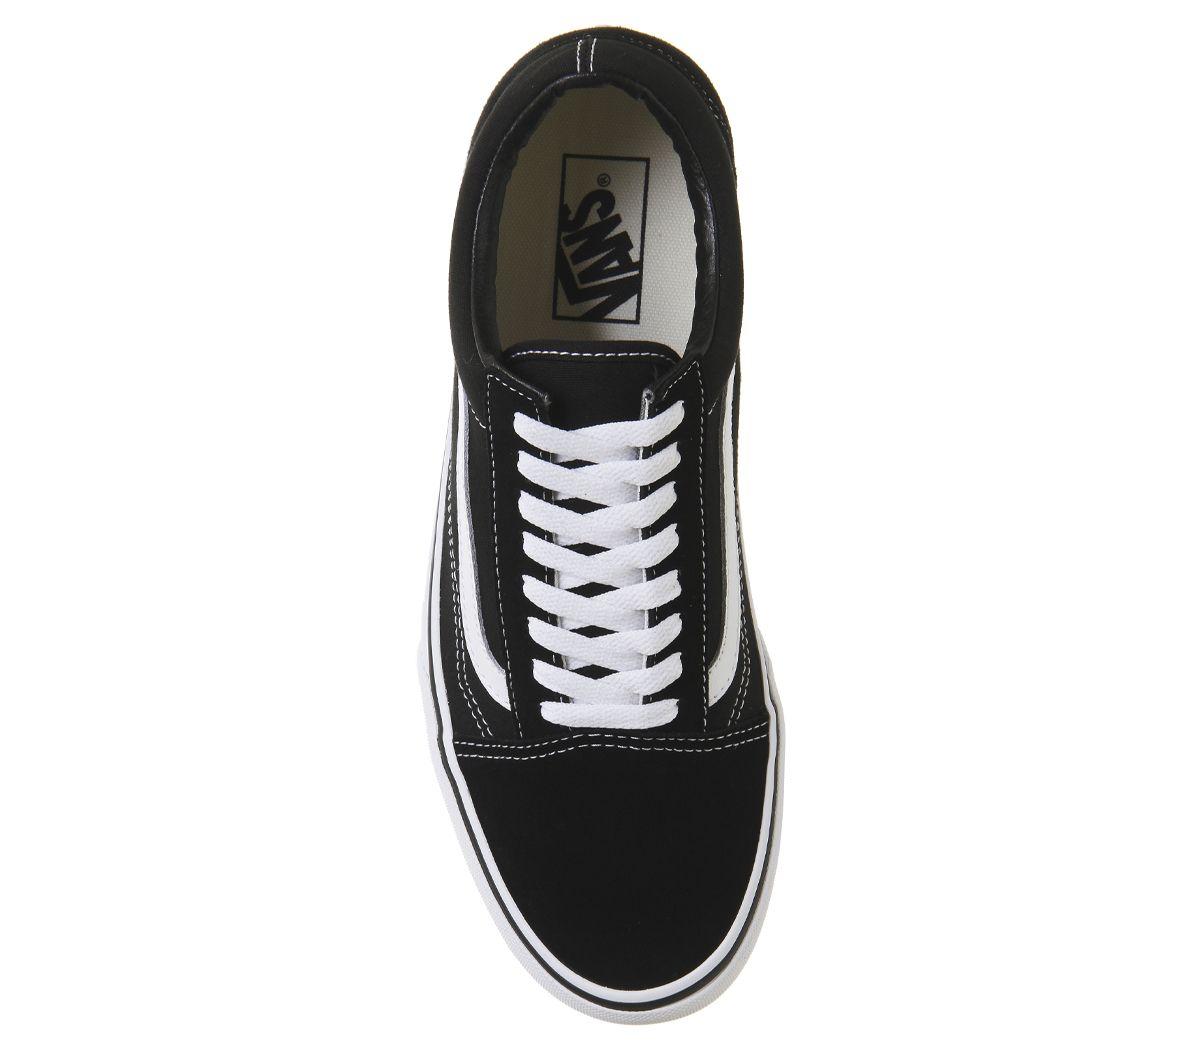 Details zu Womens Vans Old Skool Platform Black White Trainers Shoes